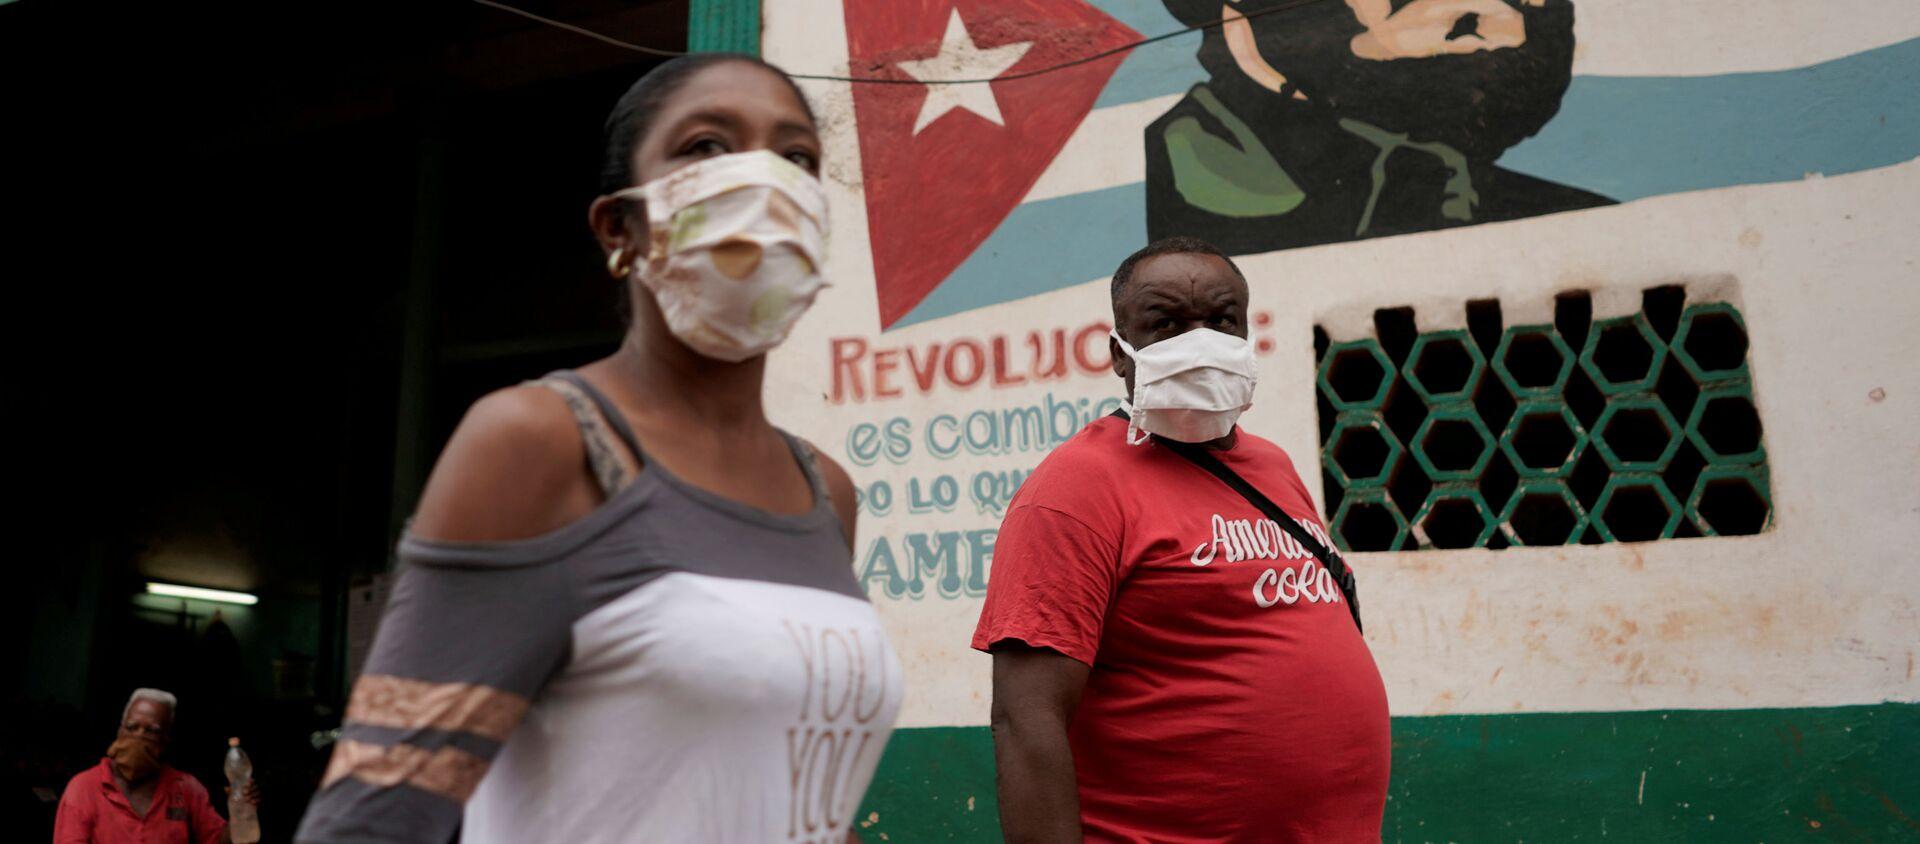 Vecinos de La Habana - Sputnik Mundo, 1920, 13.08.2020